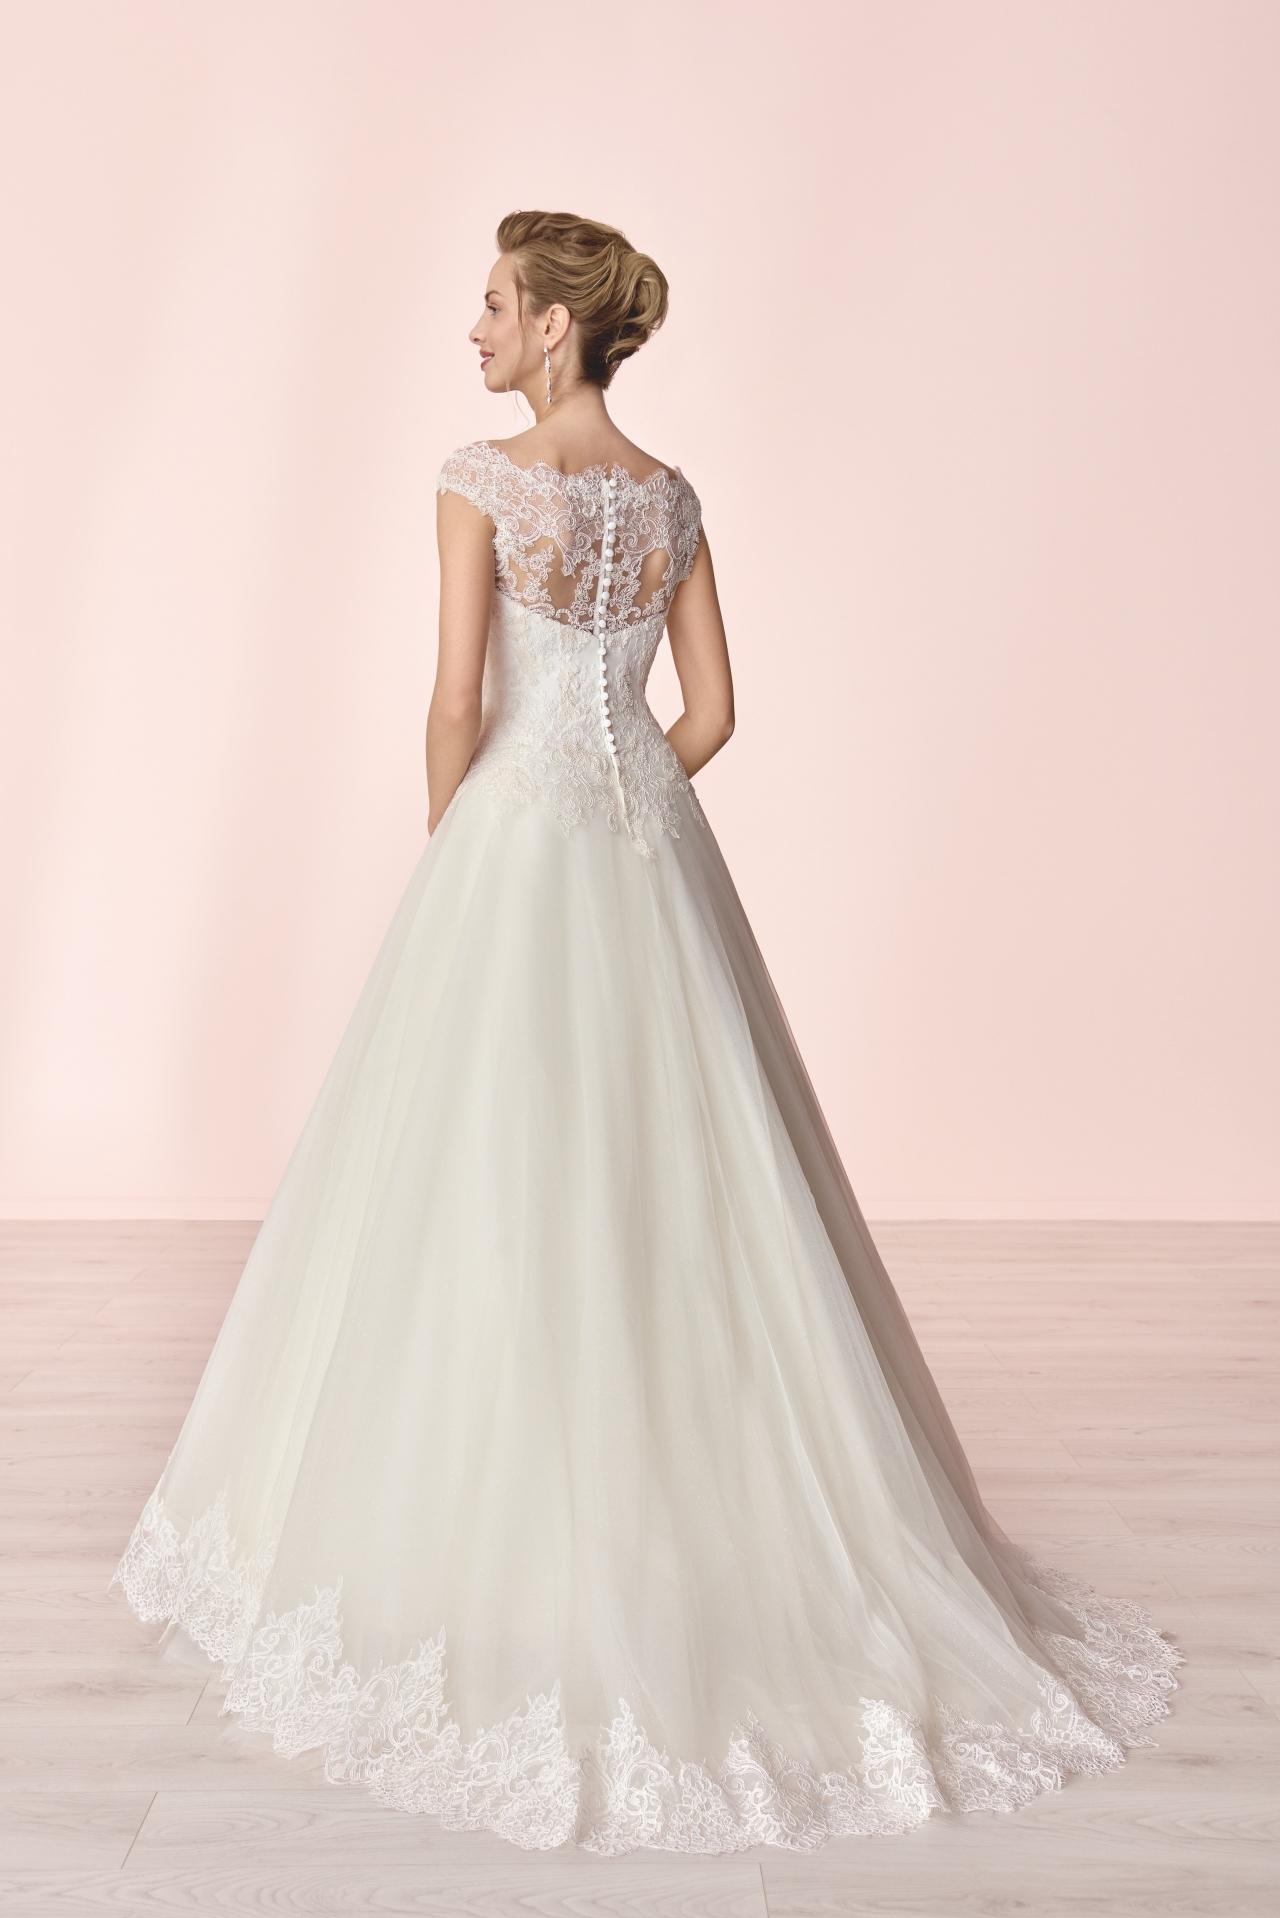 Brautkleid Elizabeth Konin 2019 - 4079T-1